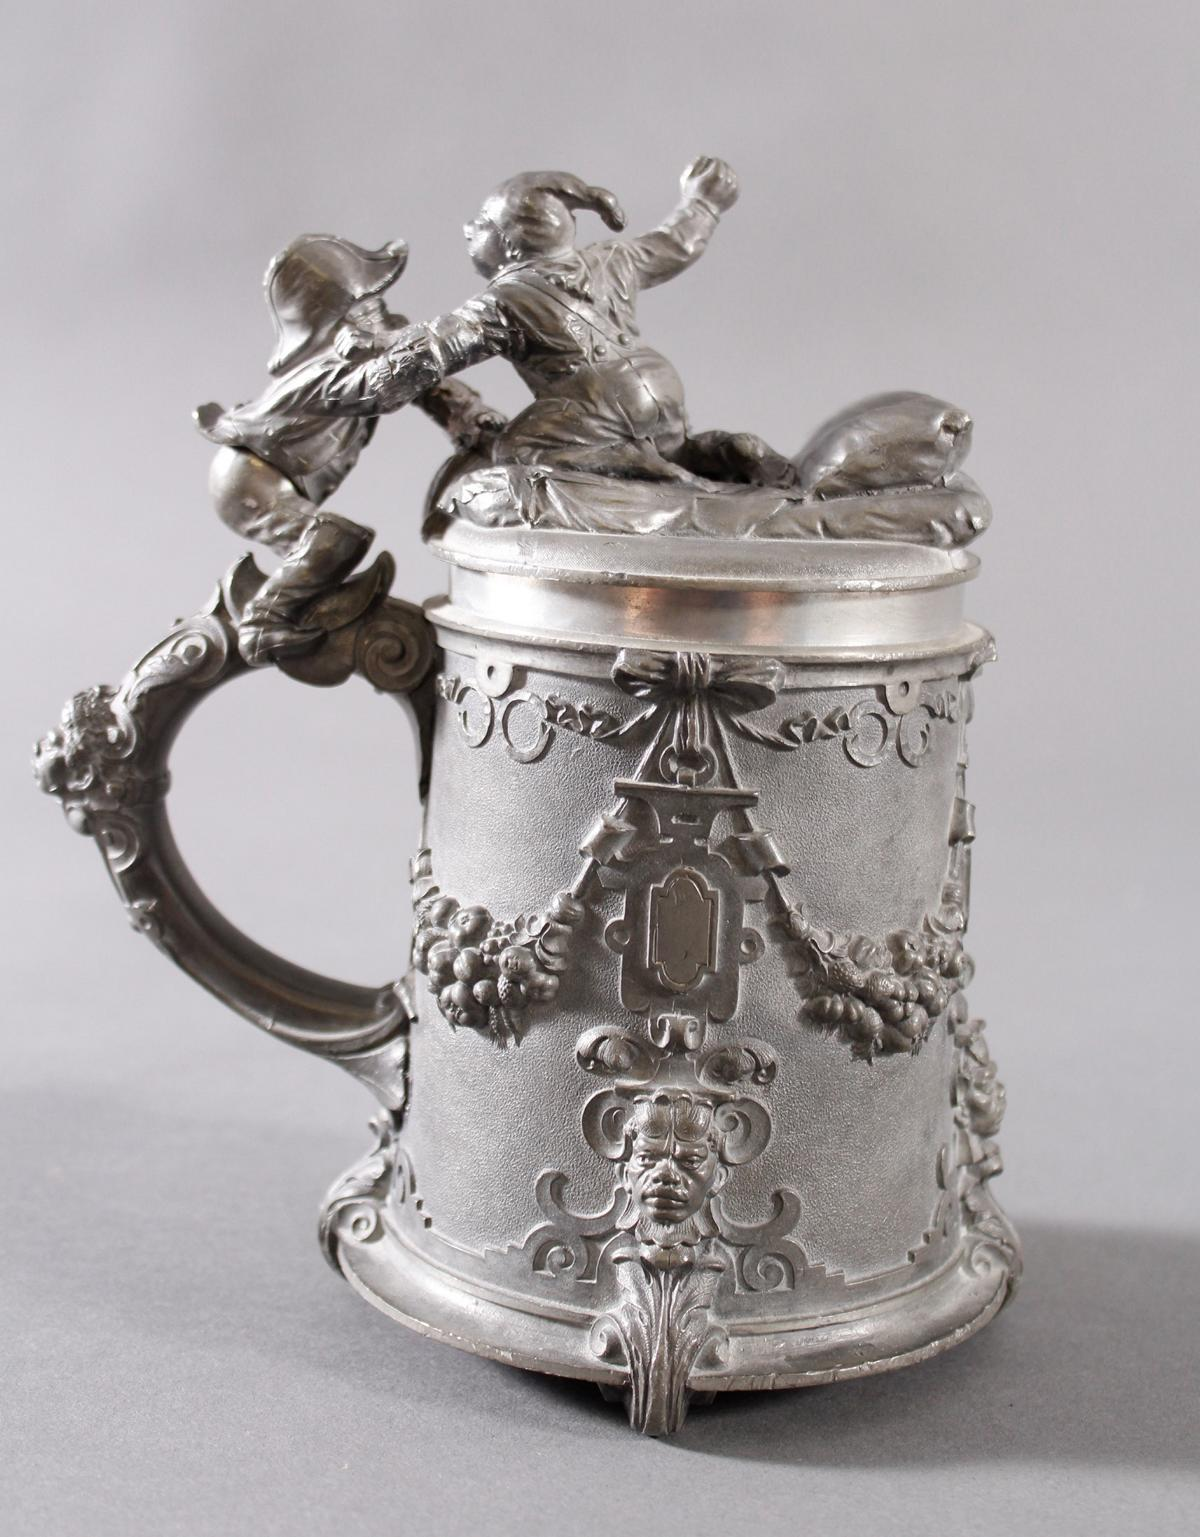 Zinn Bierkrug, Deutsch um 1890-3